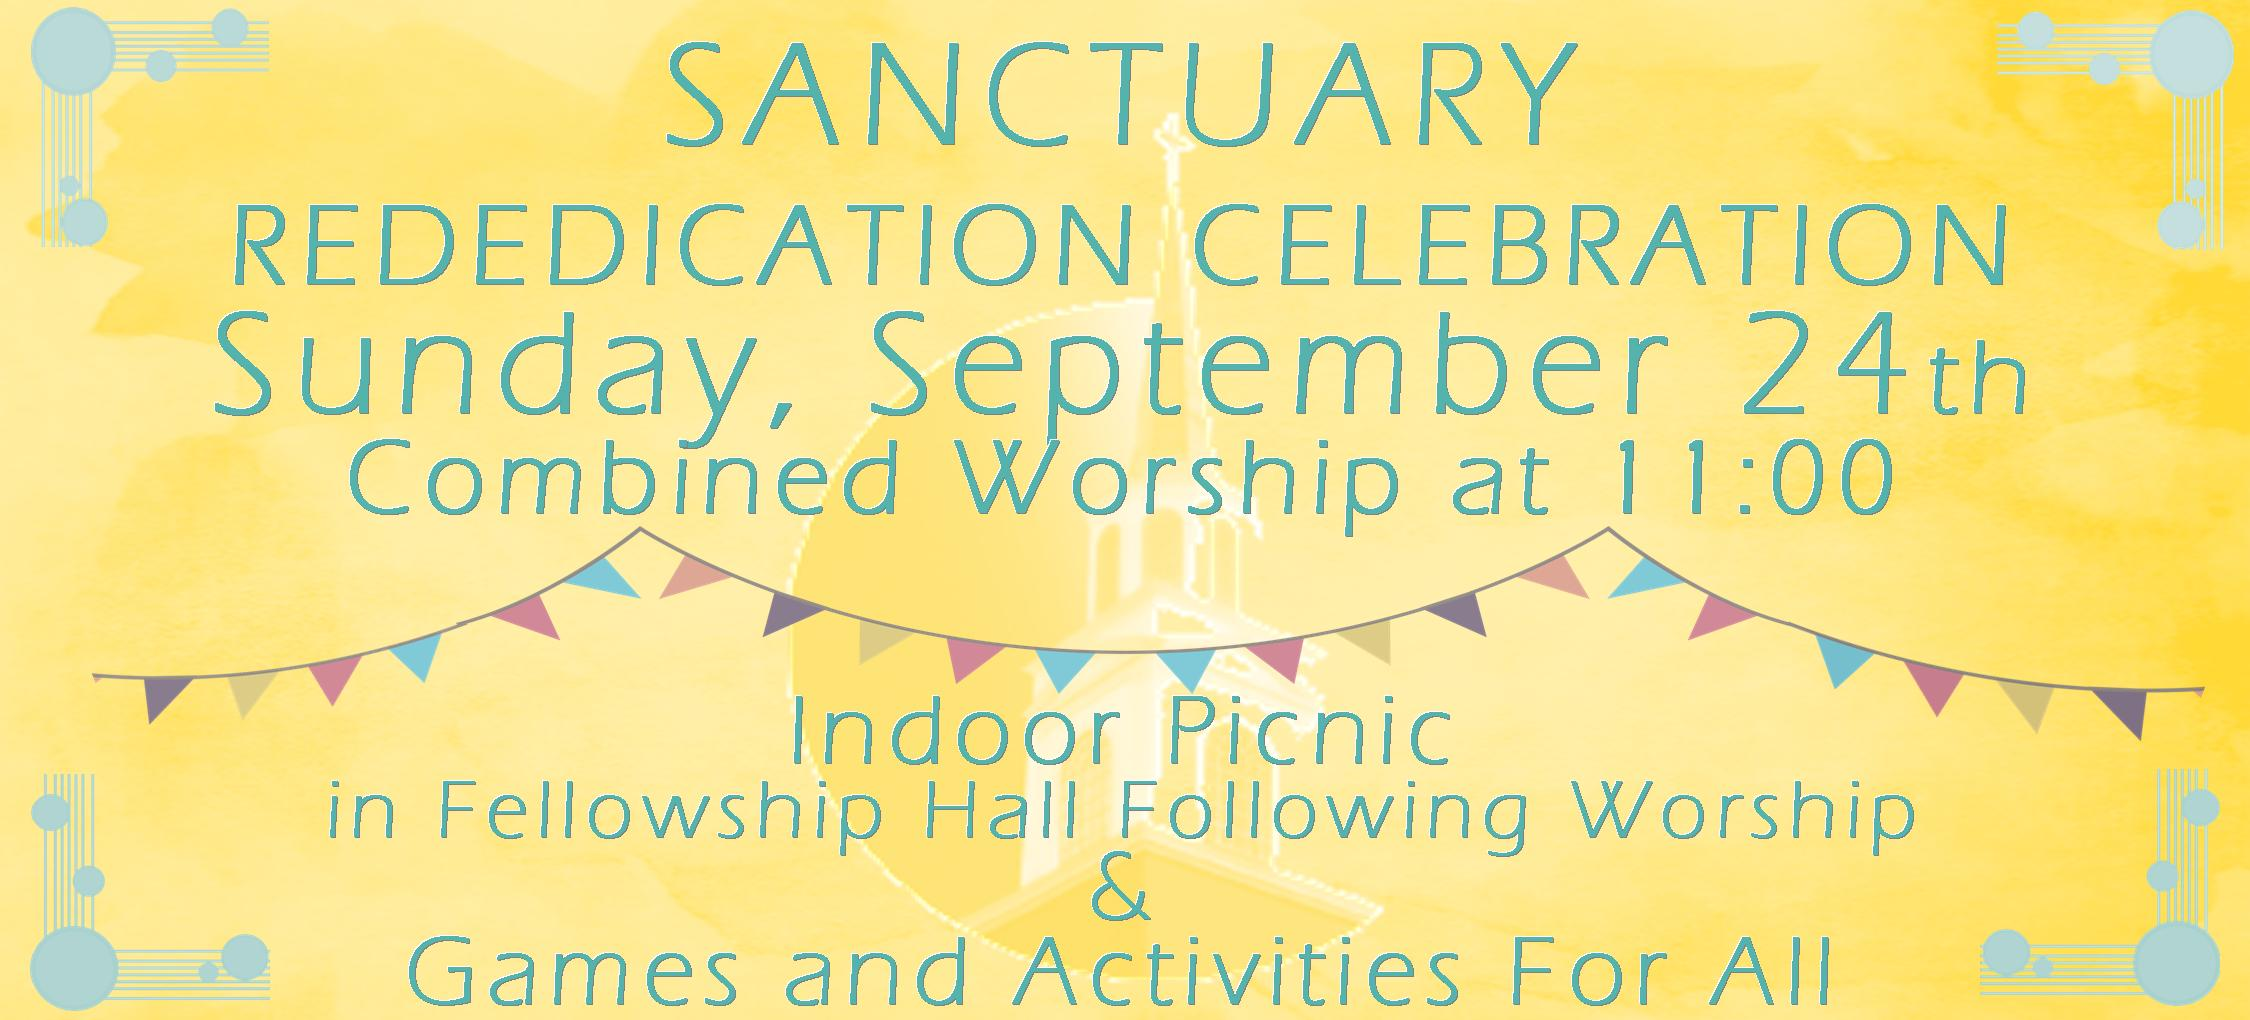 Rededication Sanctuary Slider Rev 091317.jpg